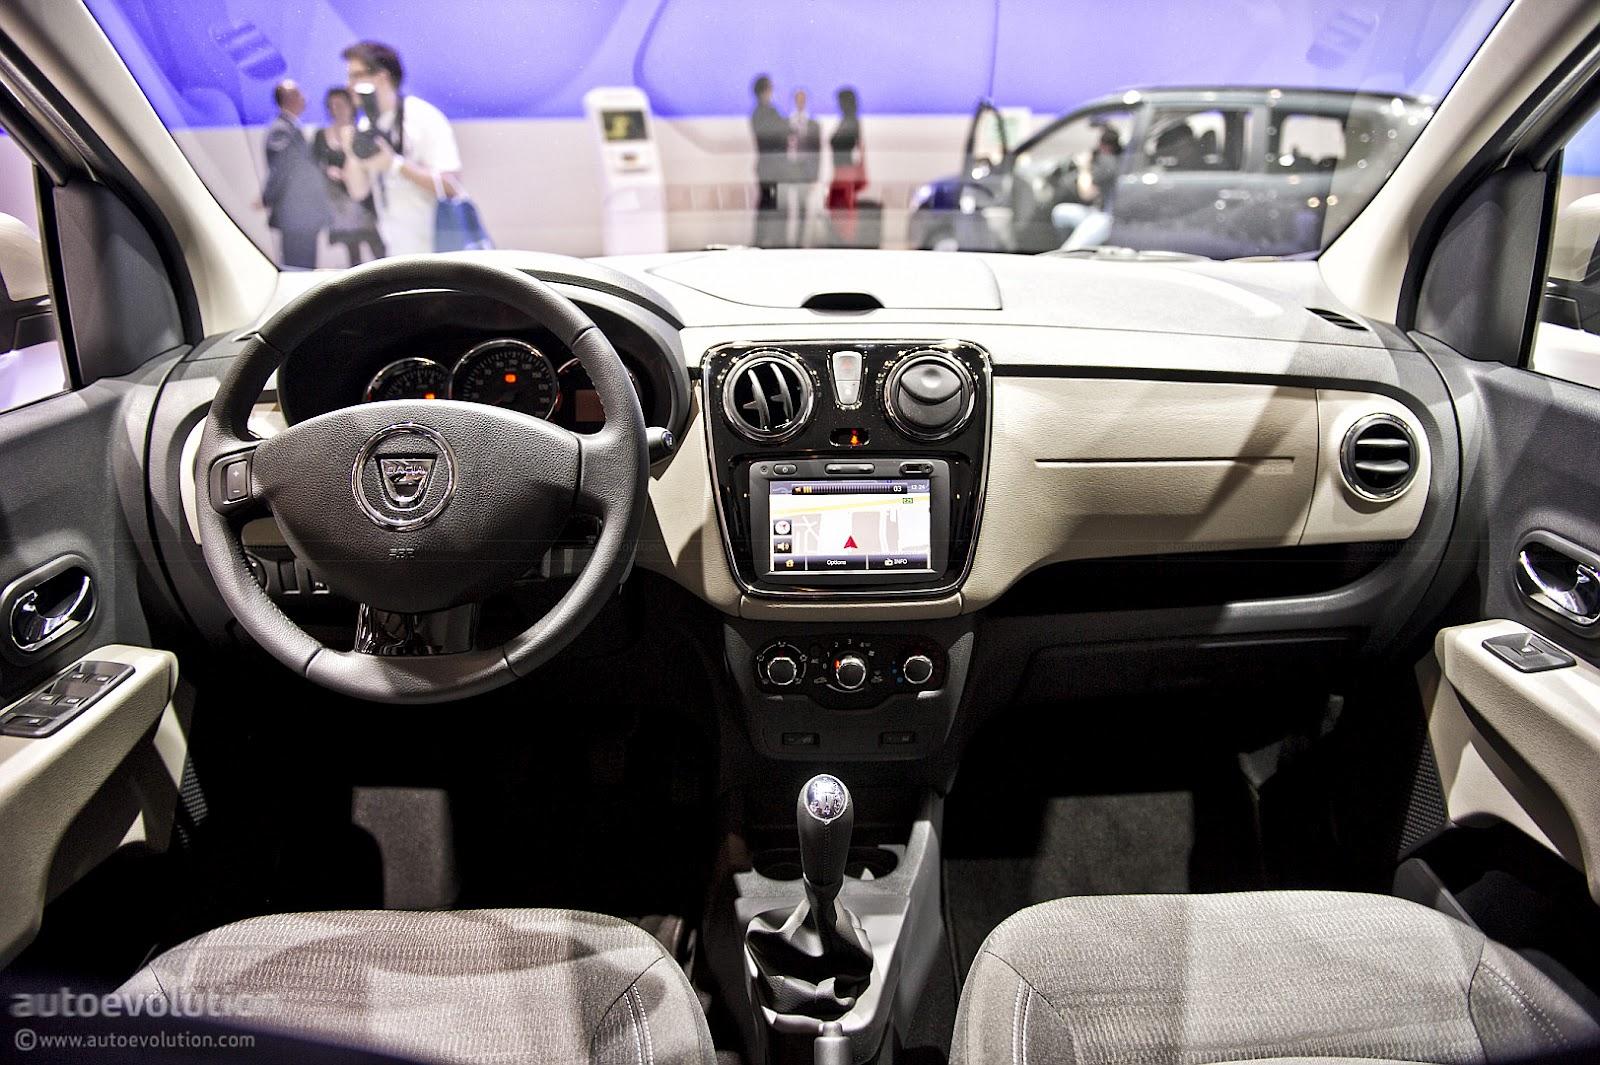 2012 Dacia lodgy Review price | 2013 Logan. - autodraaak